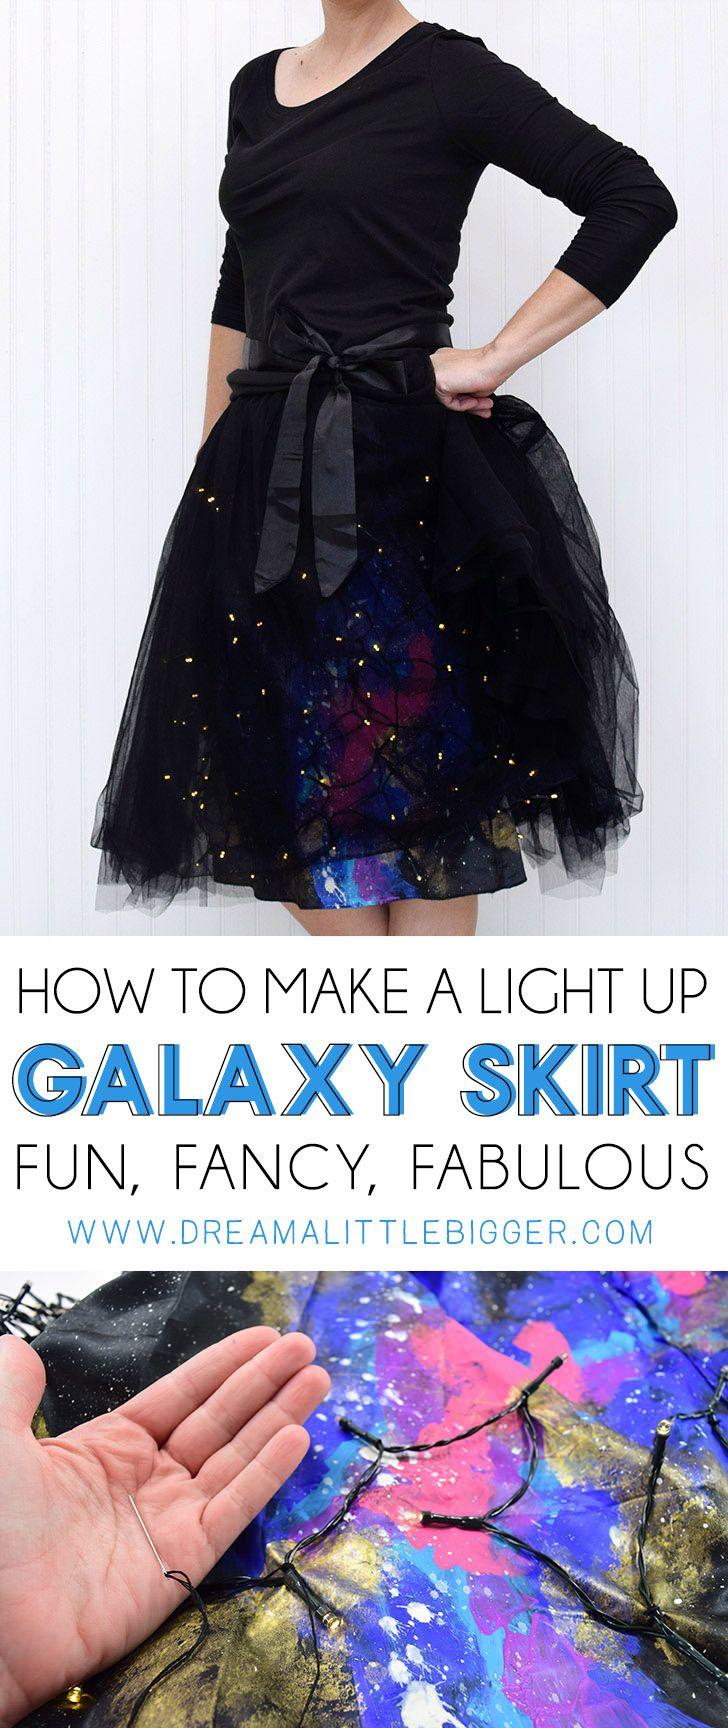 DIY Lighted Galaxy Skirt